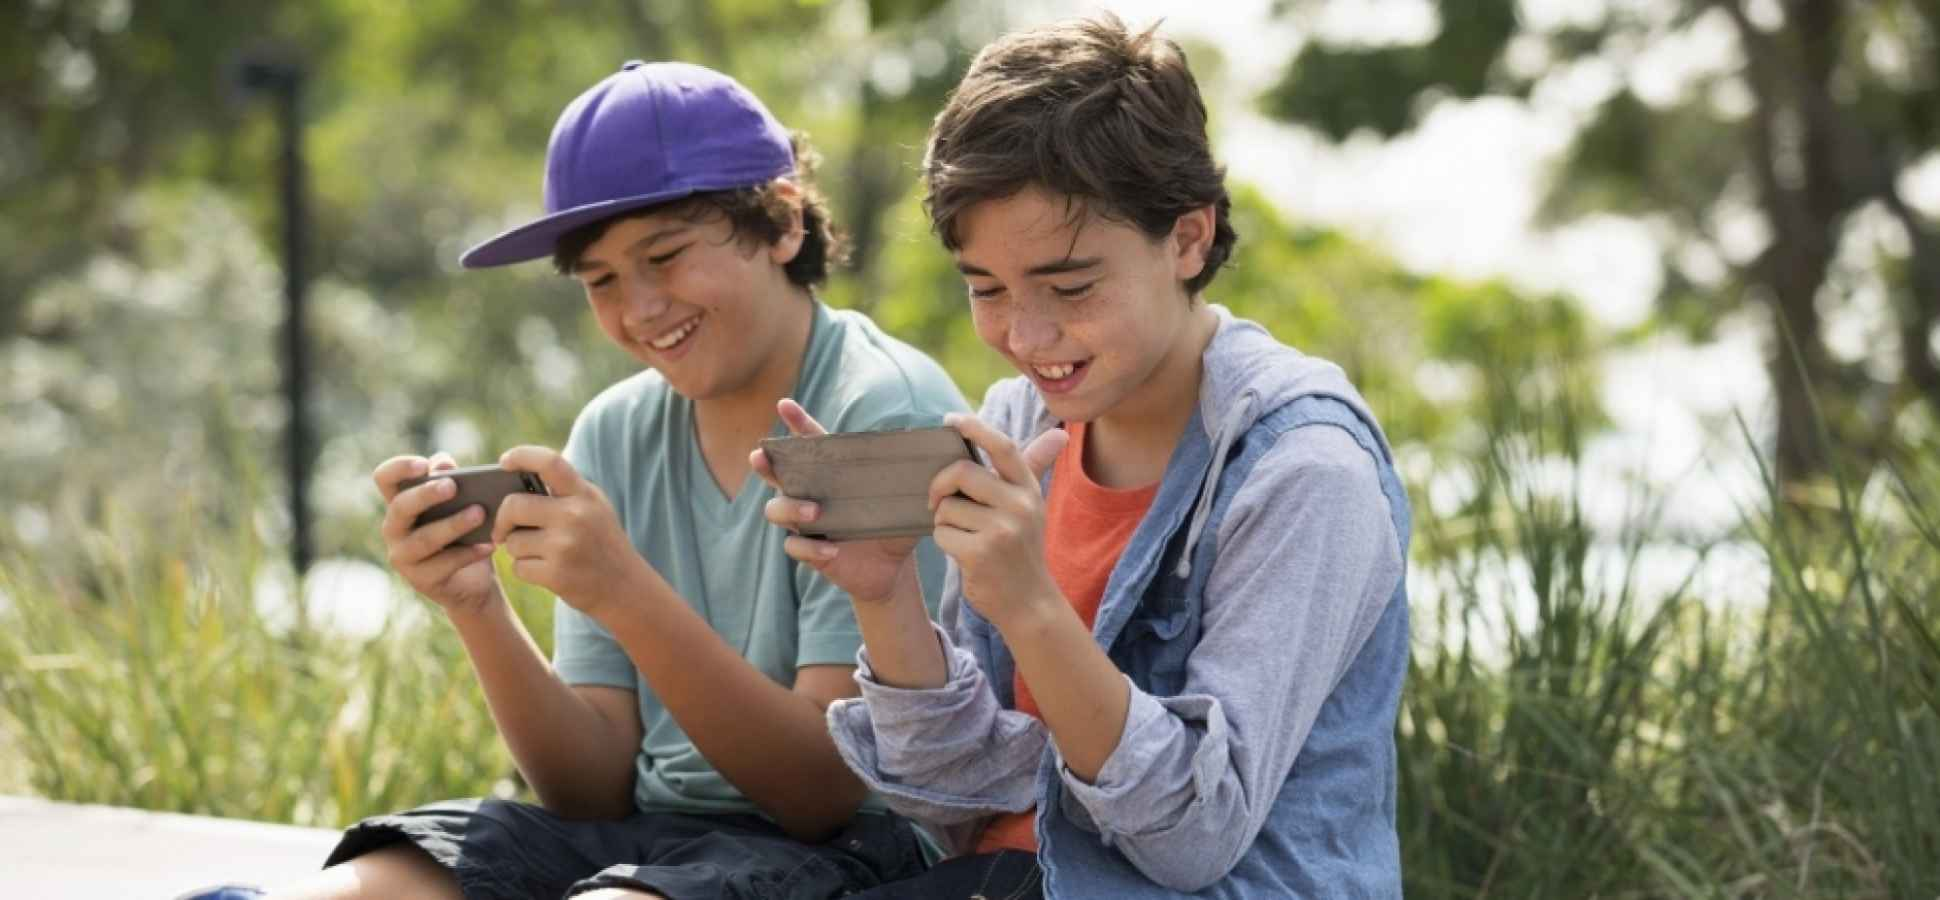 The Disruptive Innovation Behind Pokémon Go